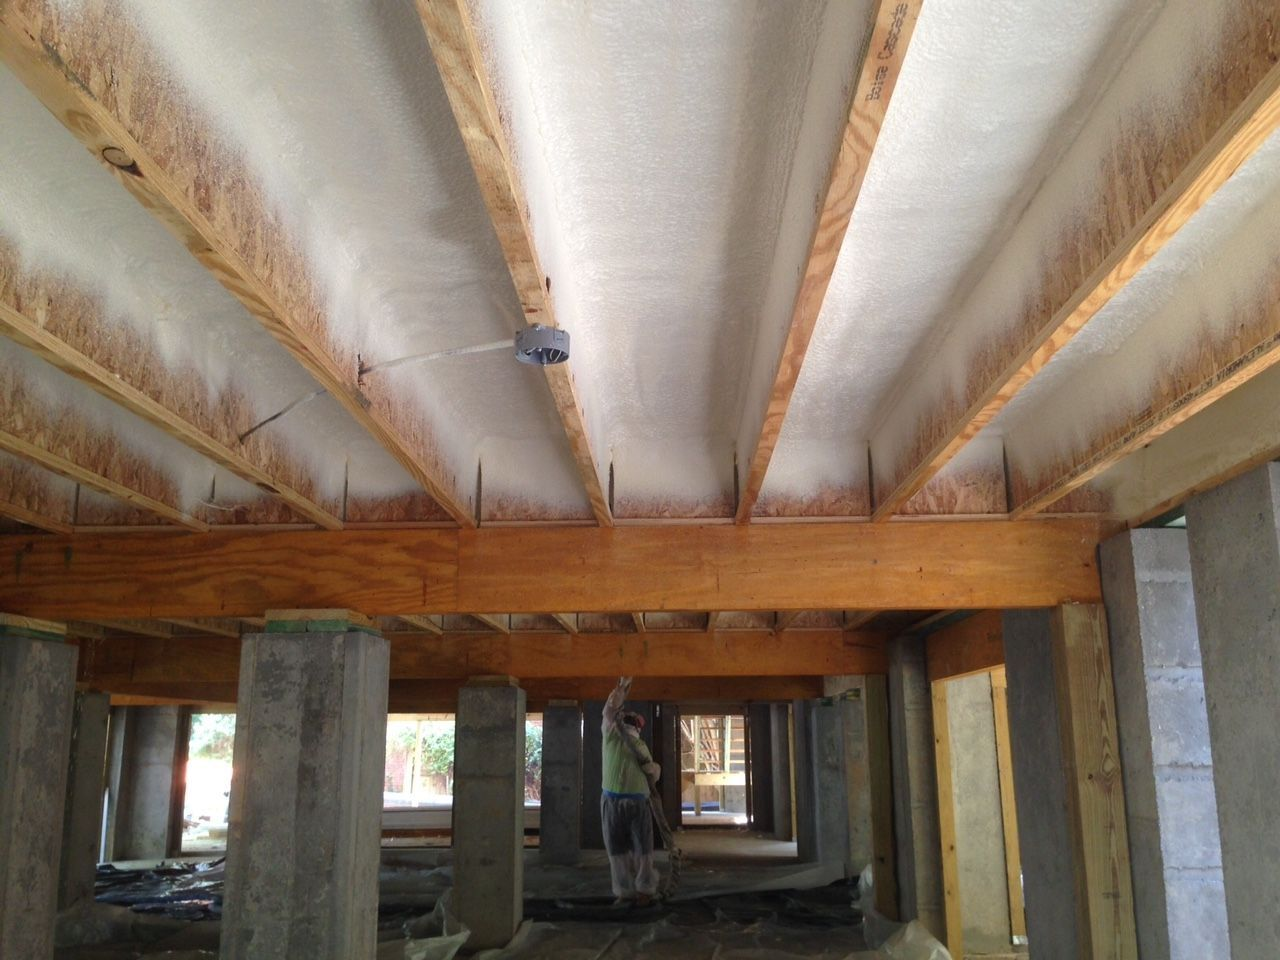 Insulation Basement Ceiling Wiring Spray For Ideas Rh Pinterest Co Uk With Vapor